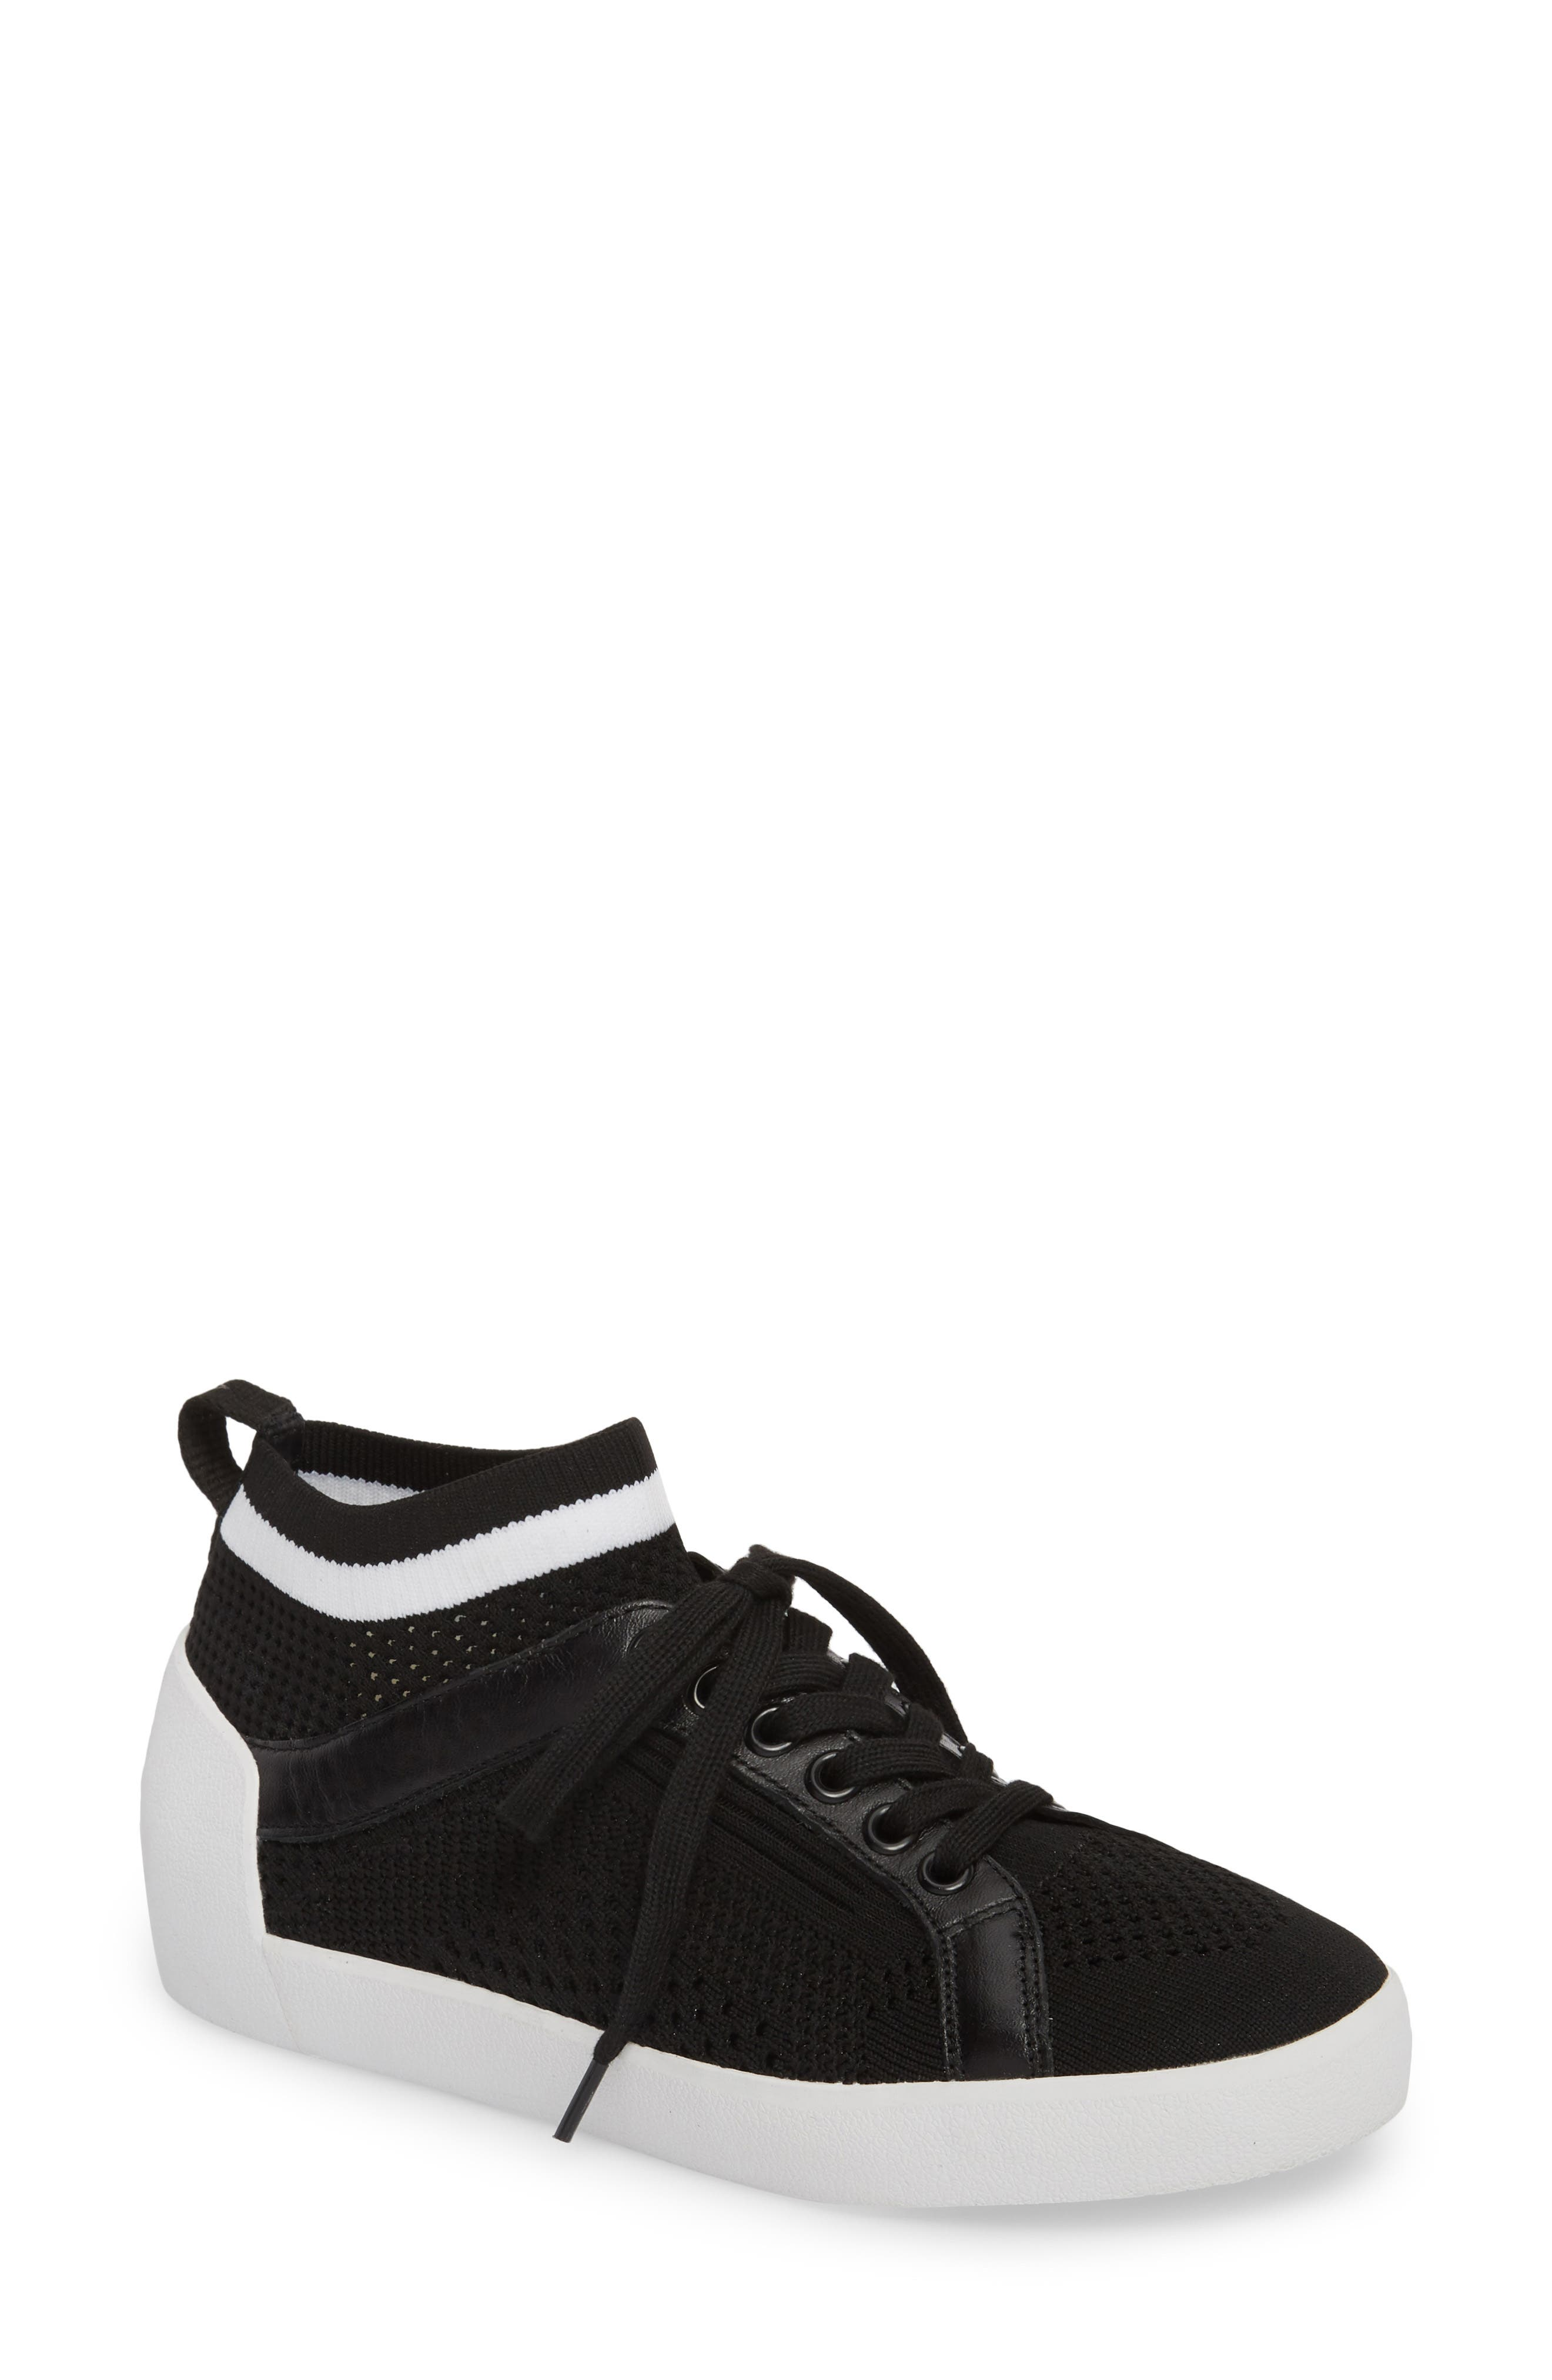 Nolita Mid Top Sock Sneaker, Main, color, 001